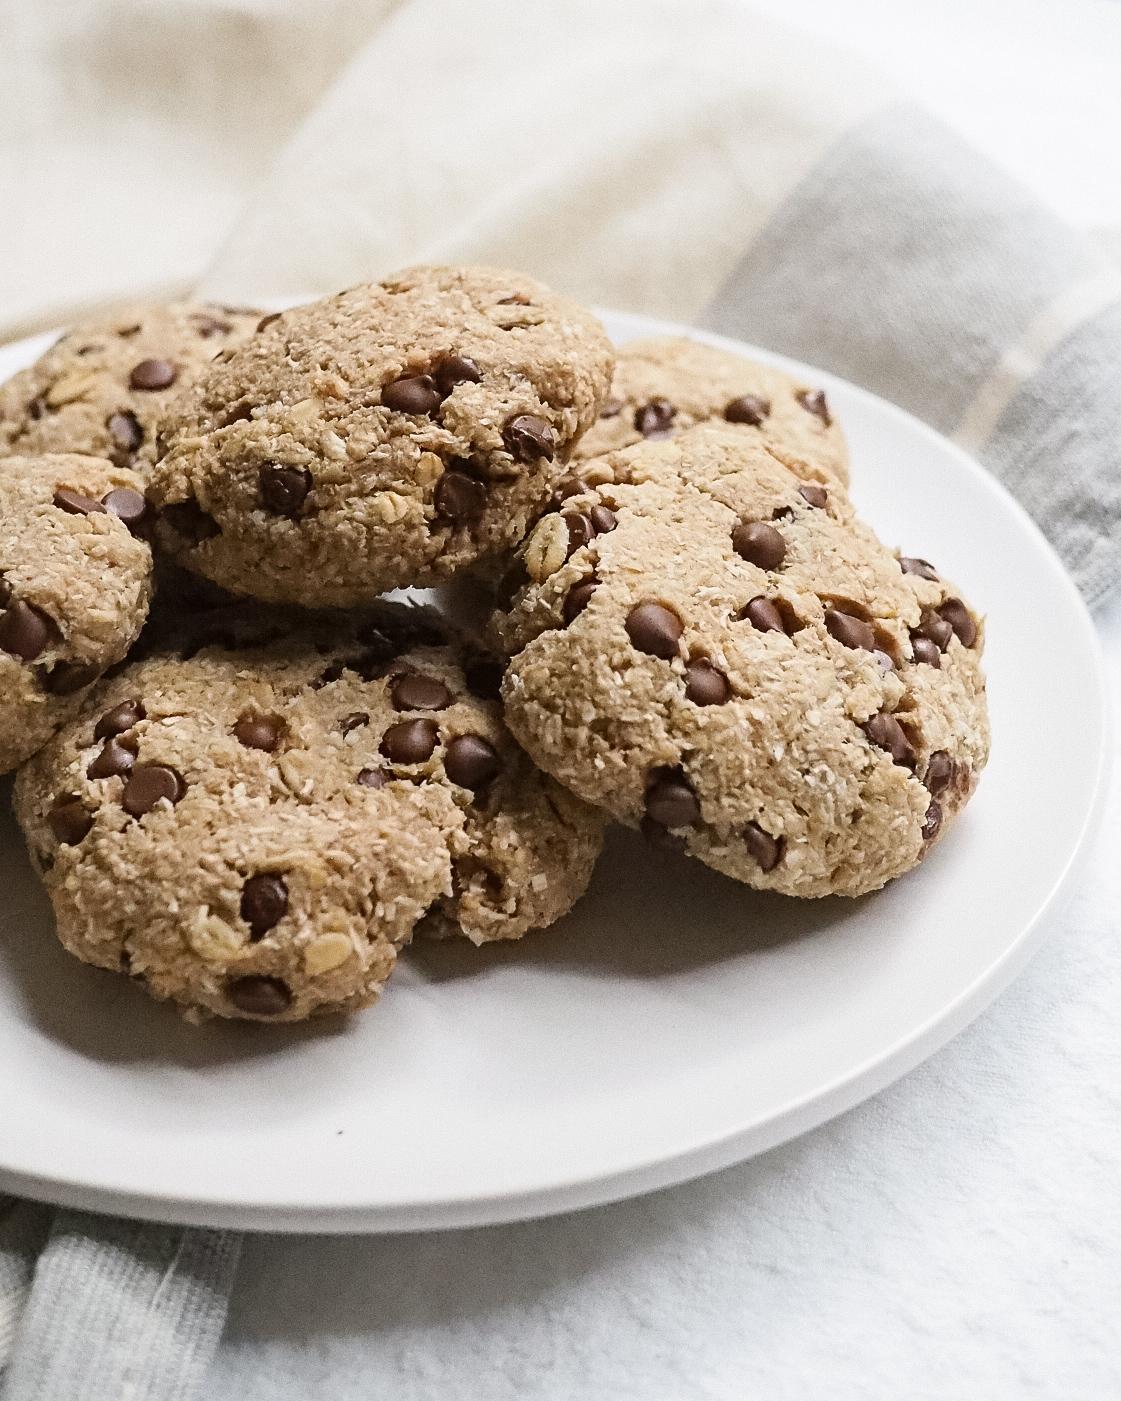 Vegan Banana Chocolate Chip Cookies - Kris Gill